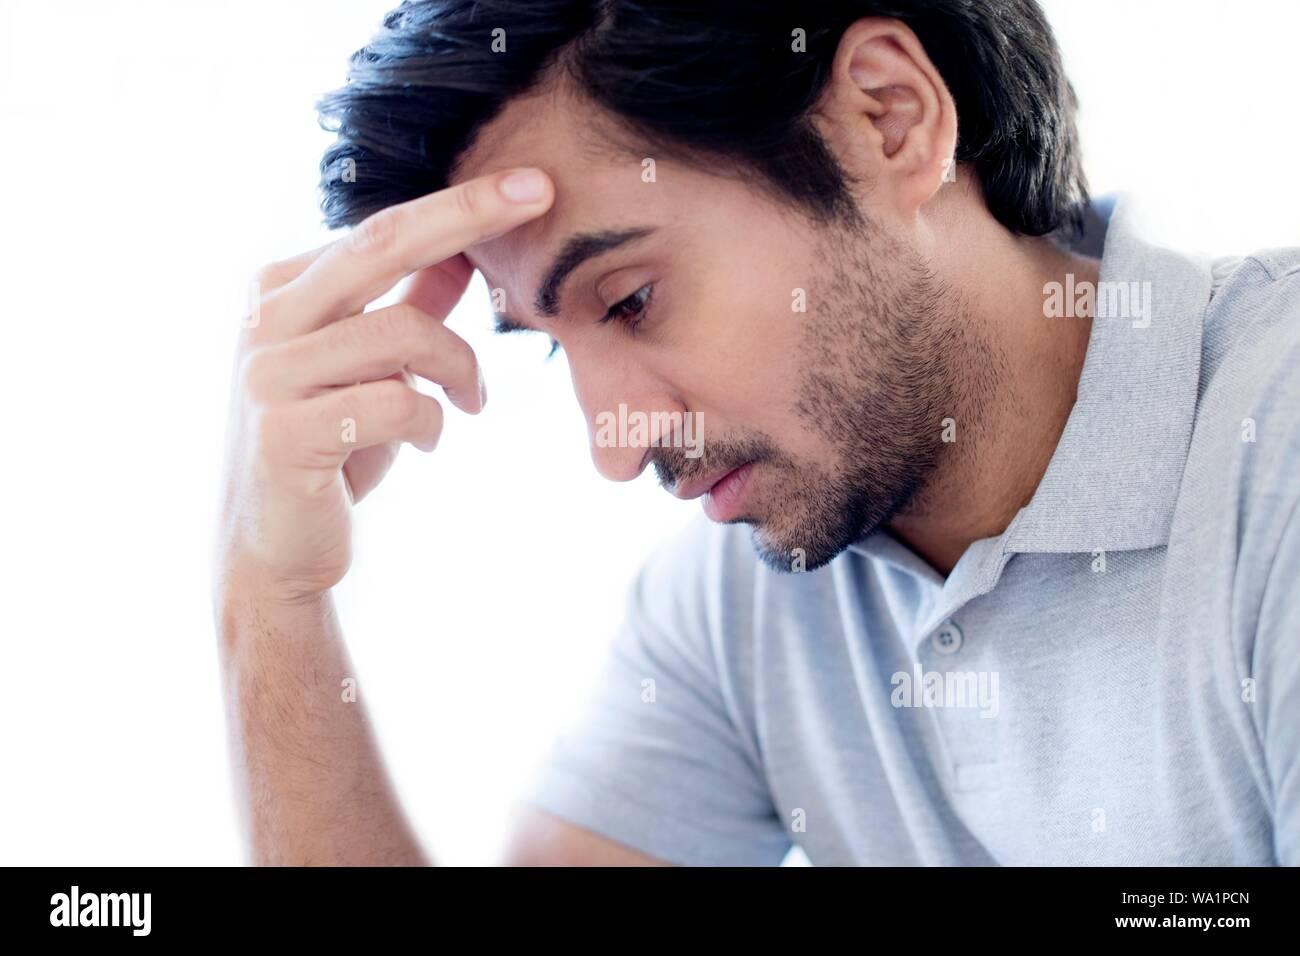 Man touching his forehead. Stock Photo